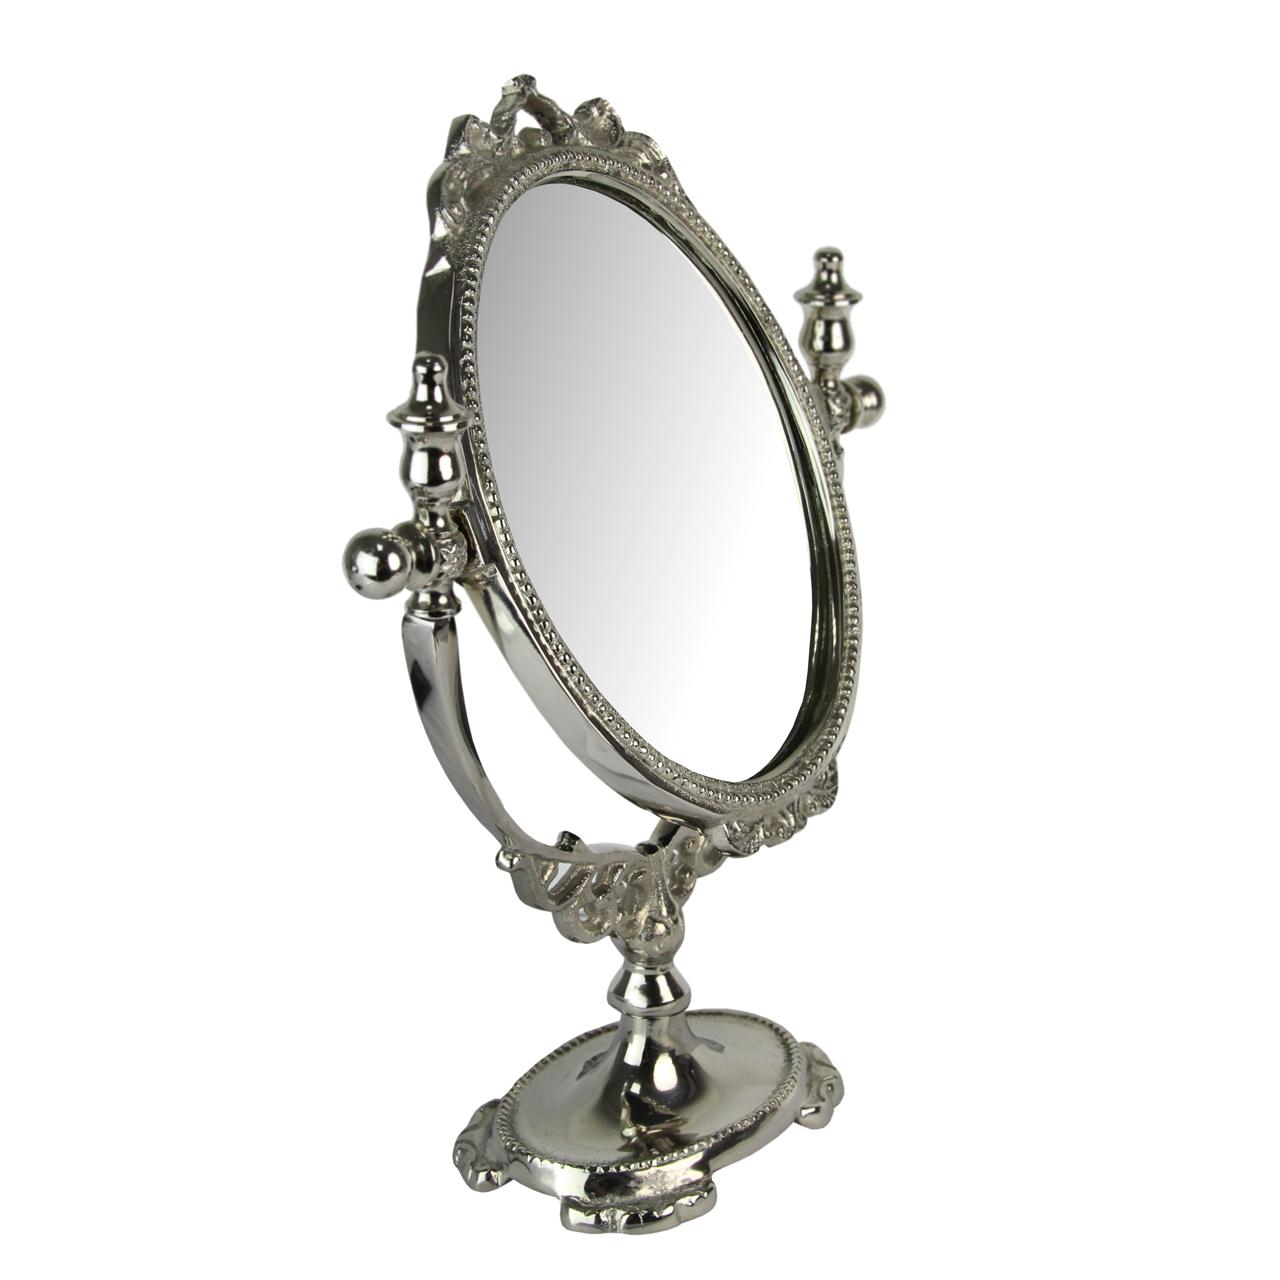 Oglinda Cu Picior Din Metal Argintiu 36x27 Cm